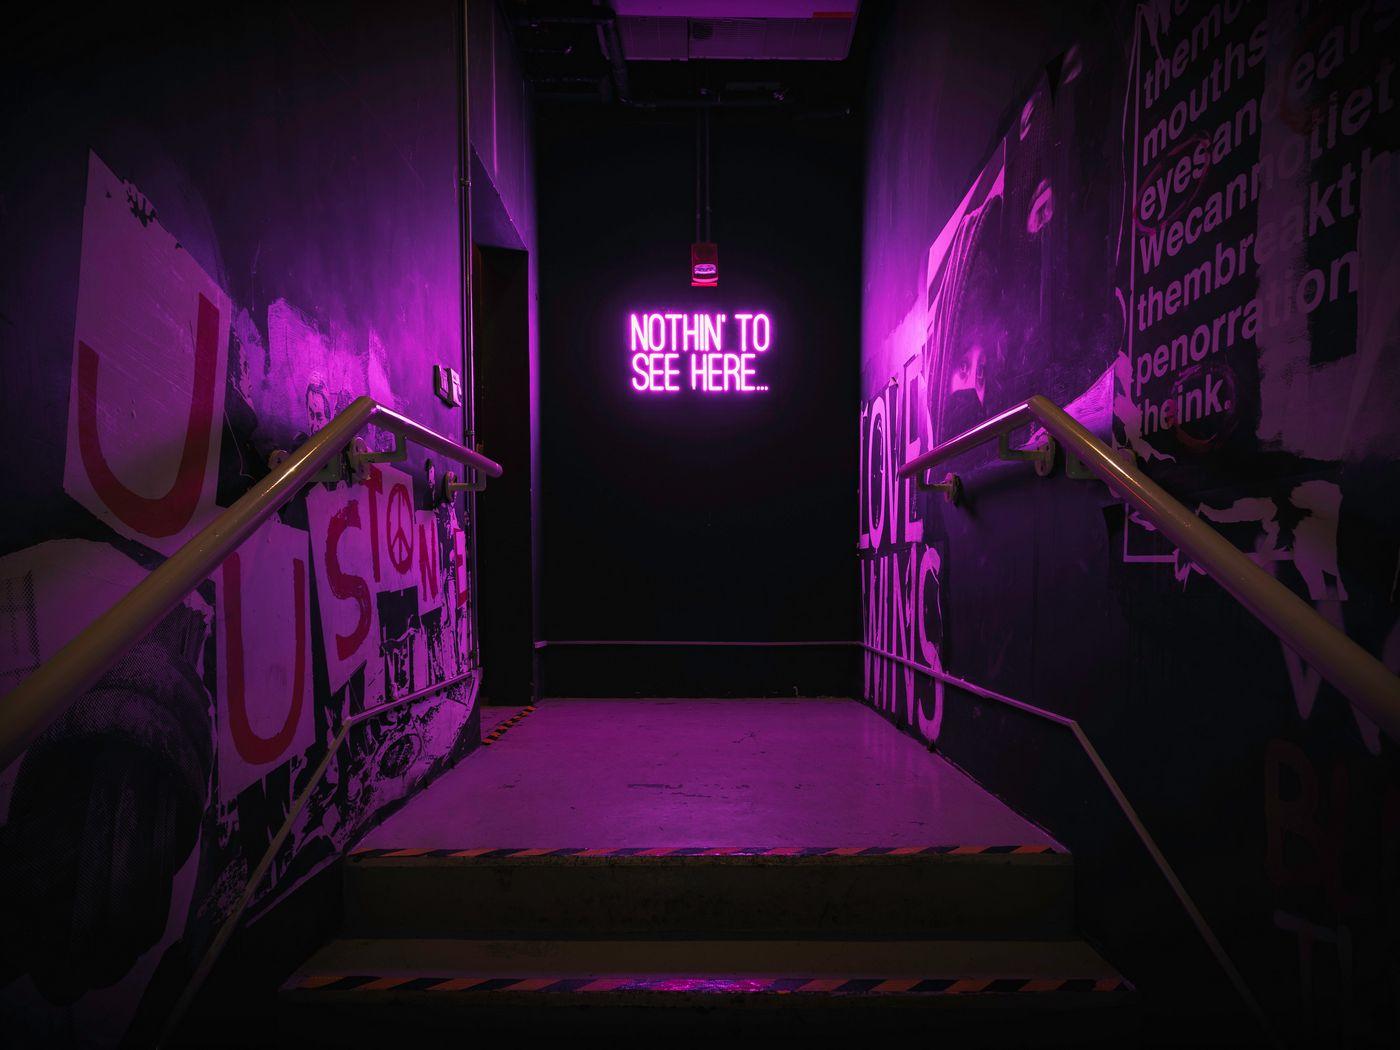 1400x1050 Wallpaper neon, inscription, wall, purple, backlight